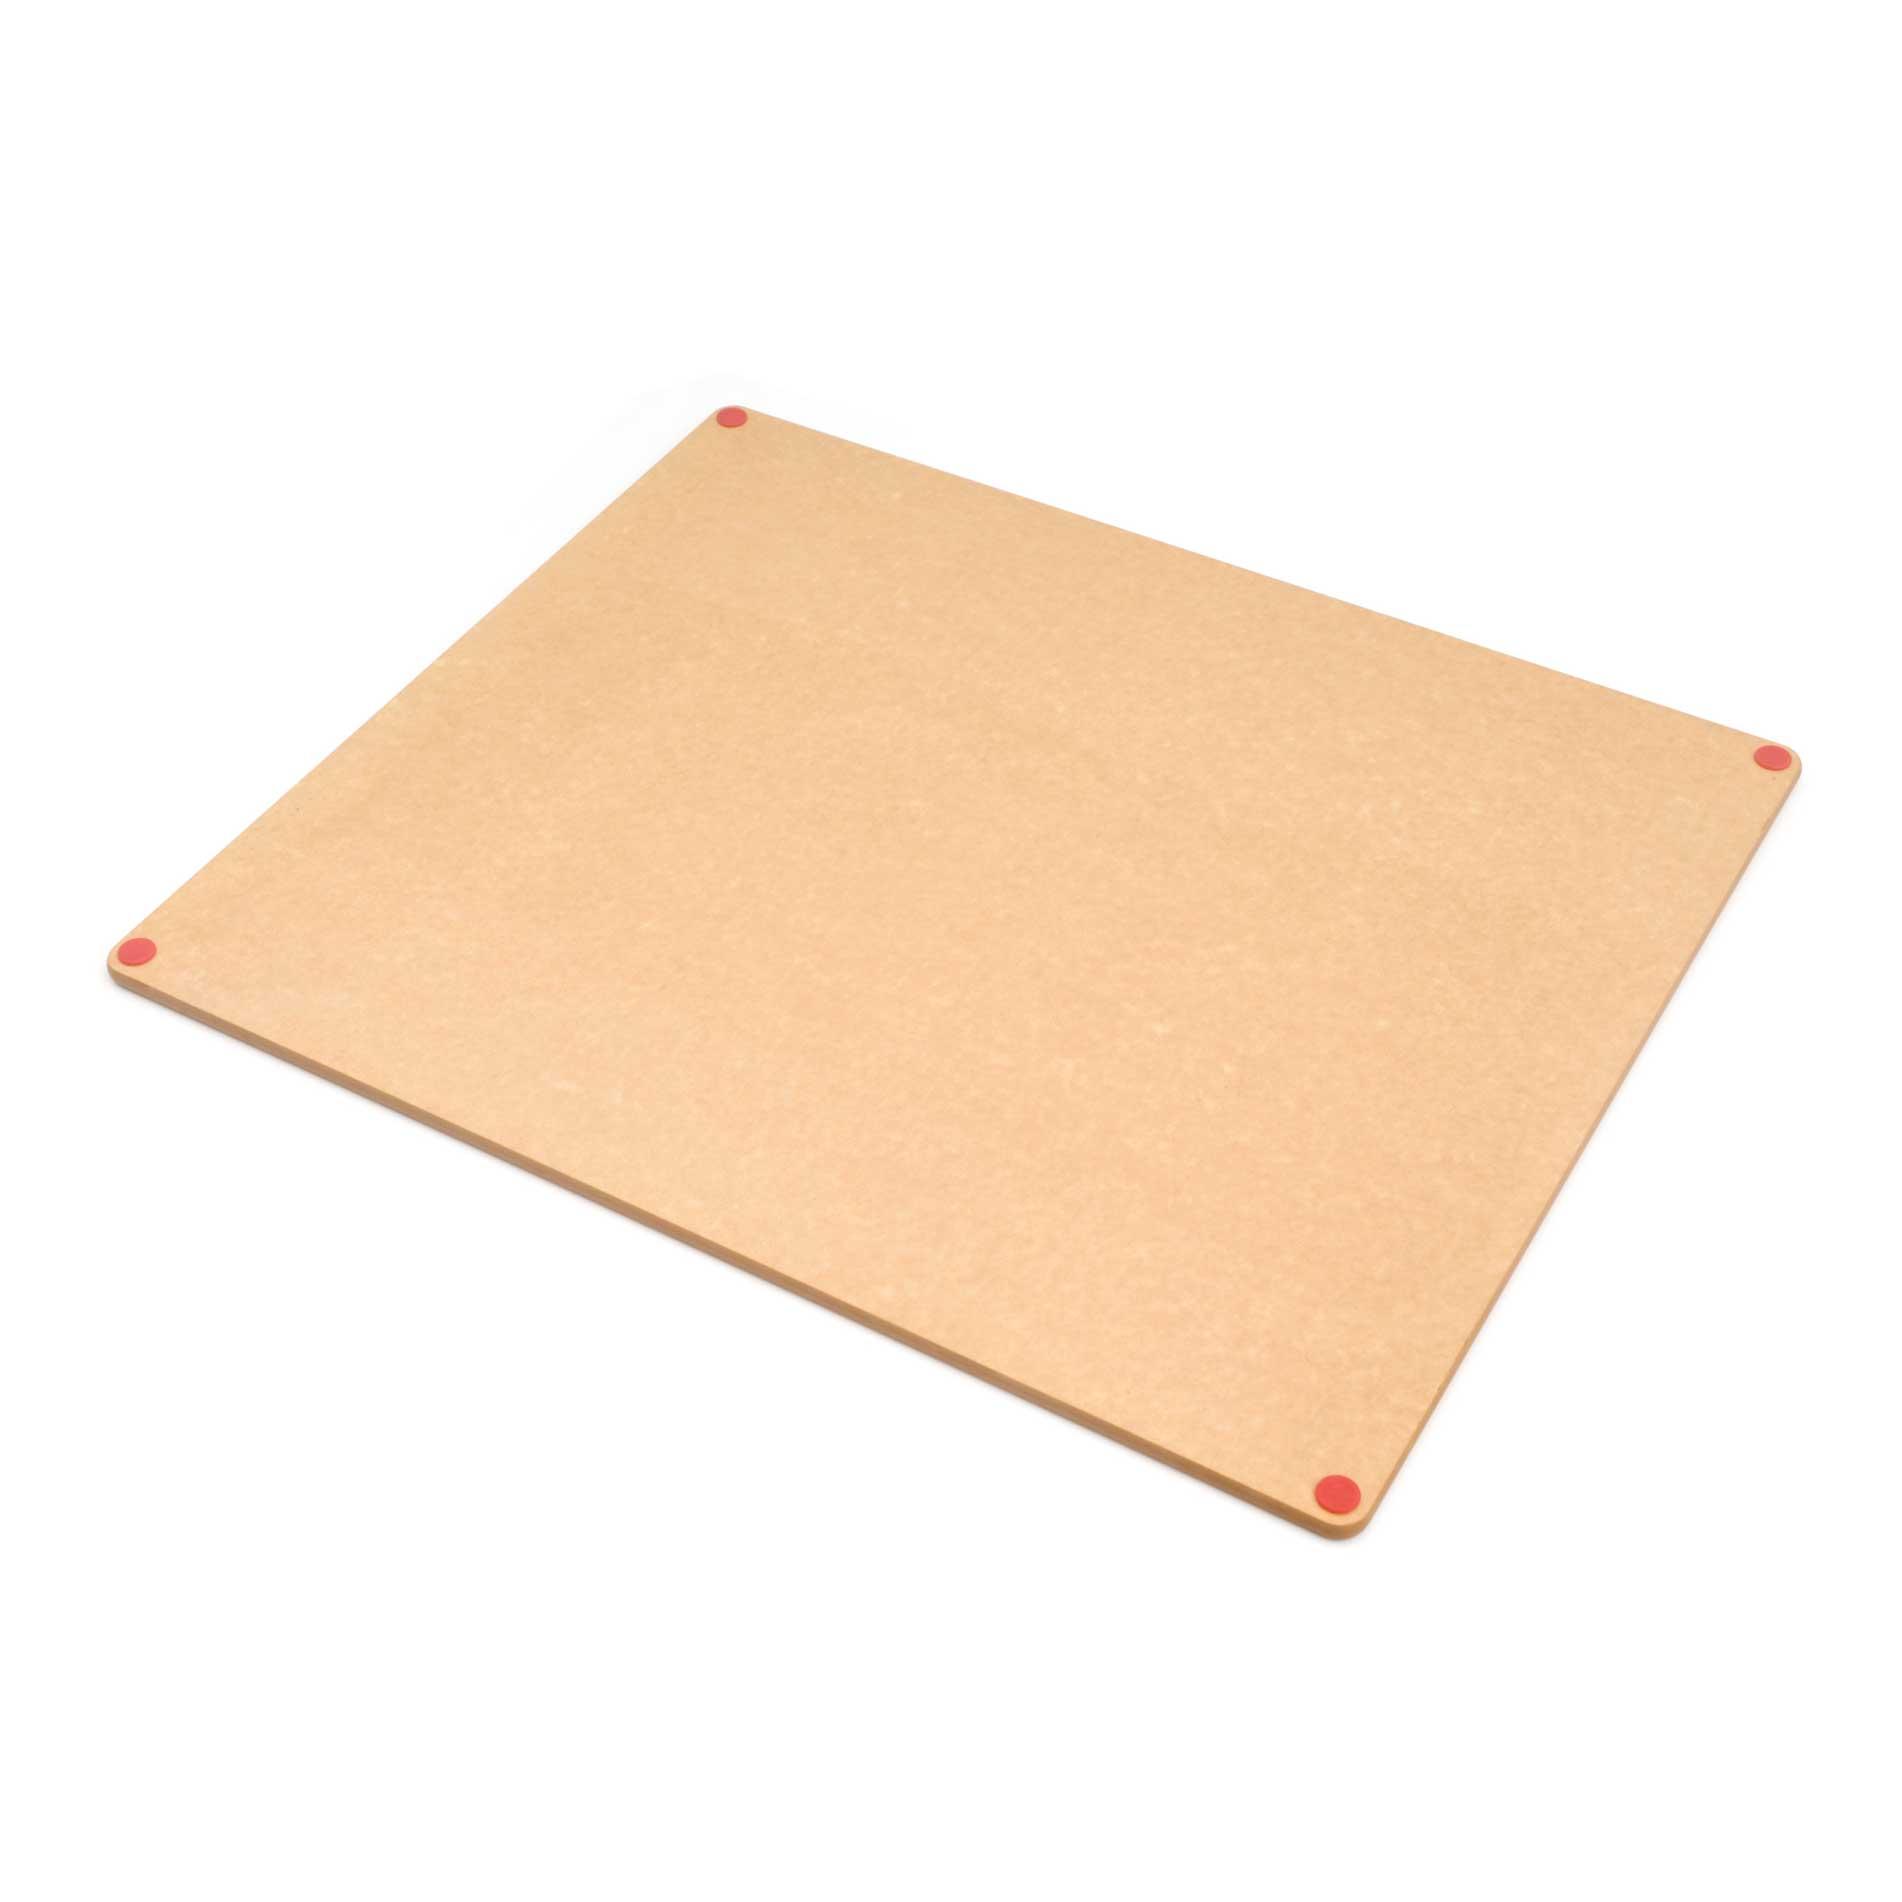 Victorinox Swiss Army 622-23190105 cutting board, wood